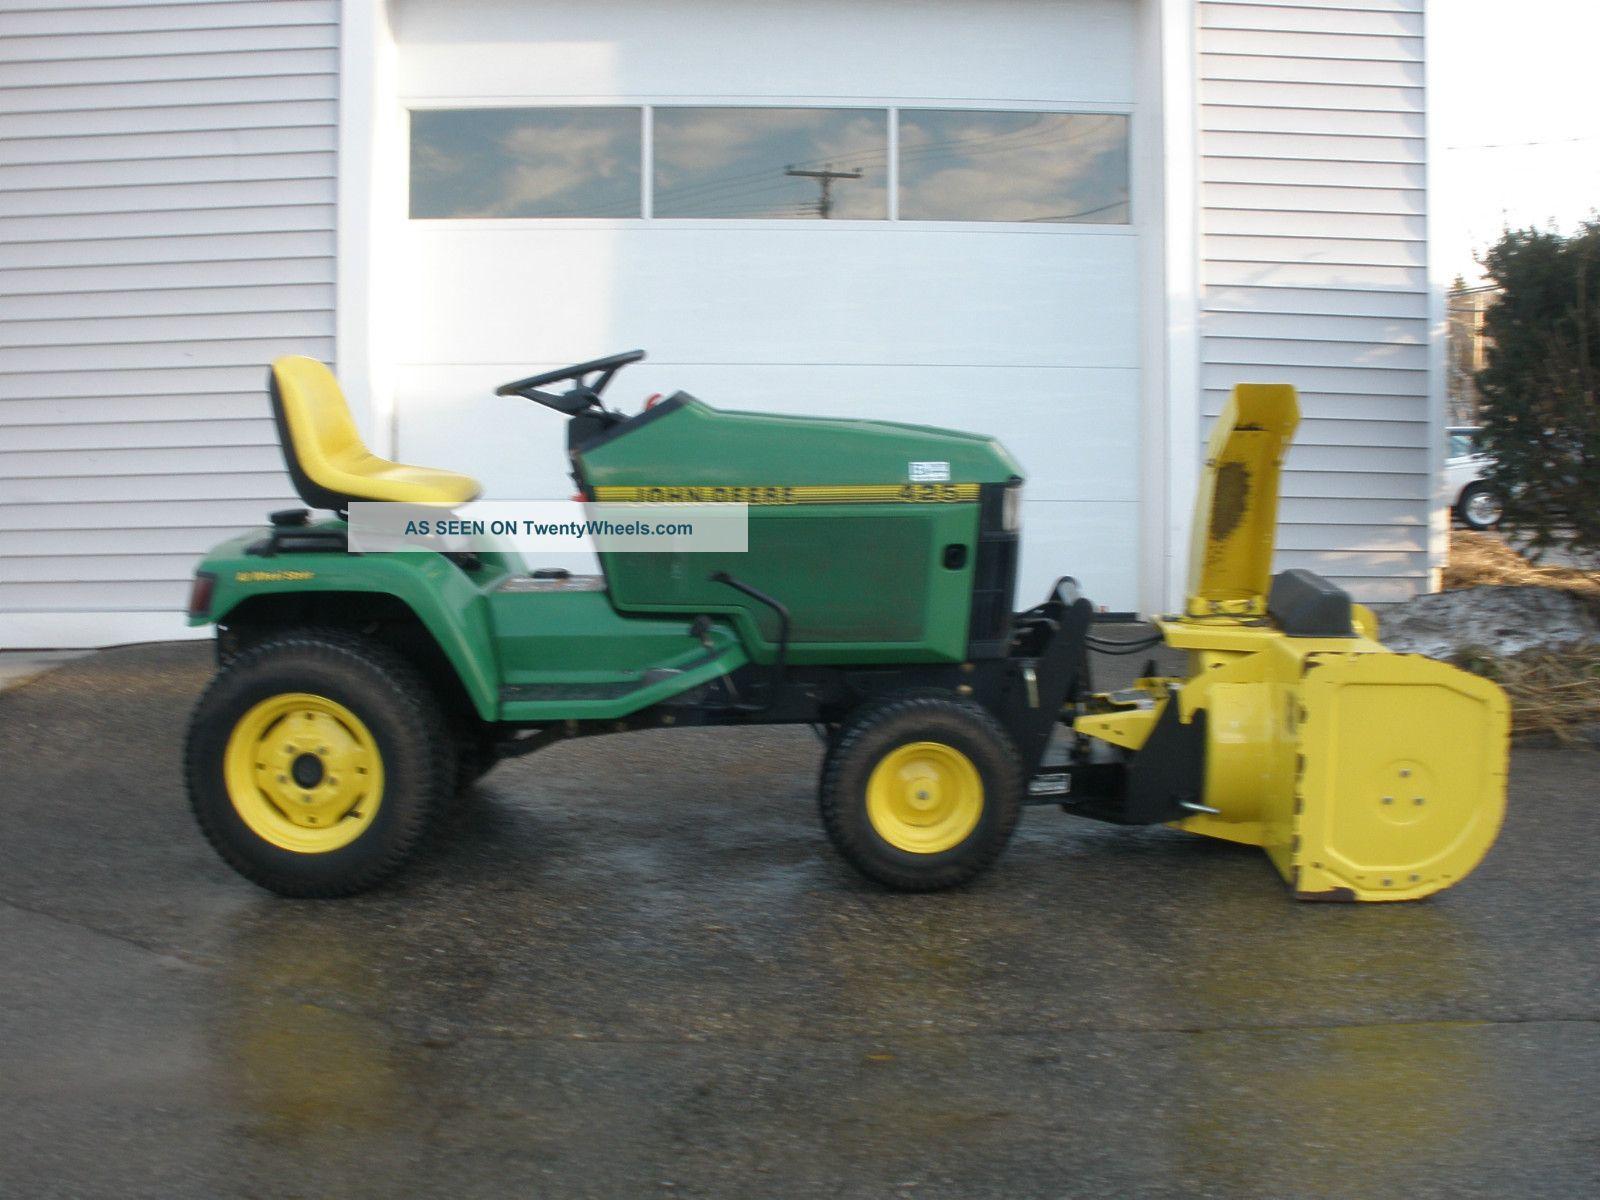 John Deere 425 All Wheel Steer Tractor W/ Snow Blower ...